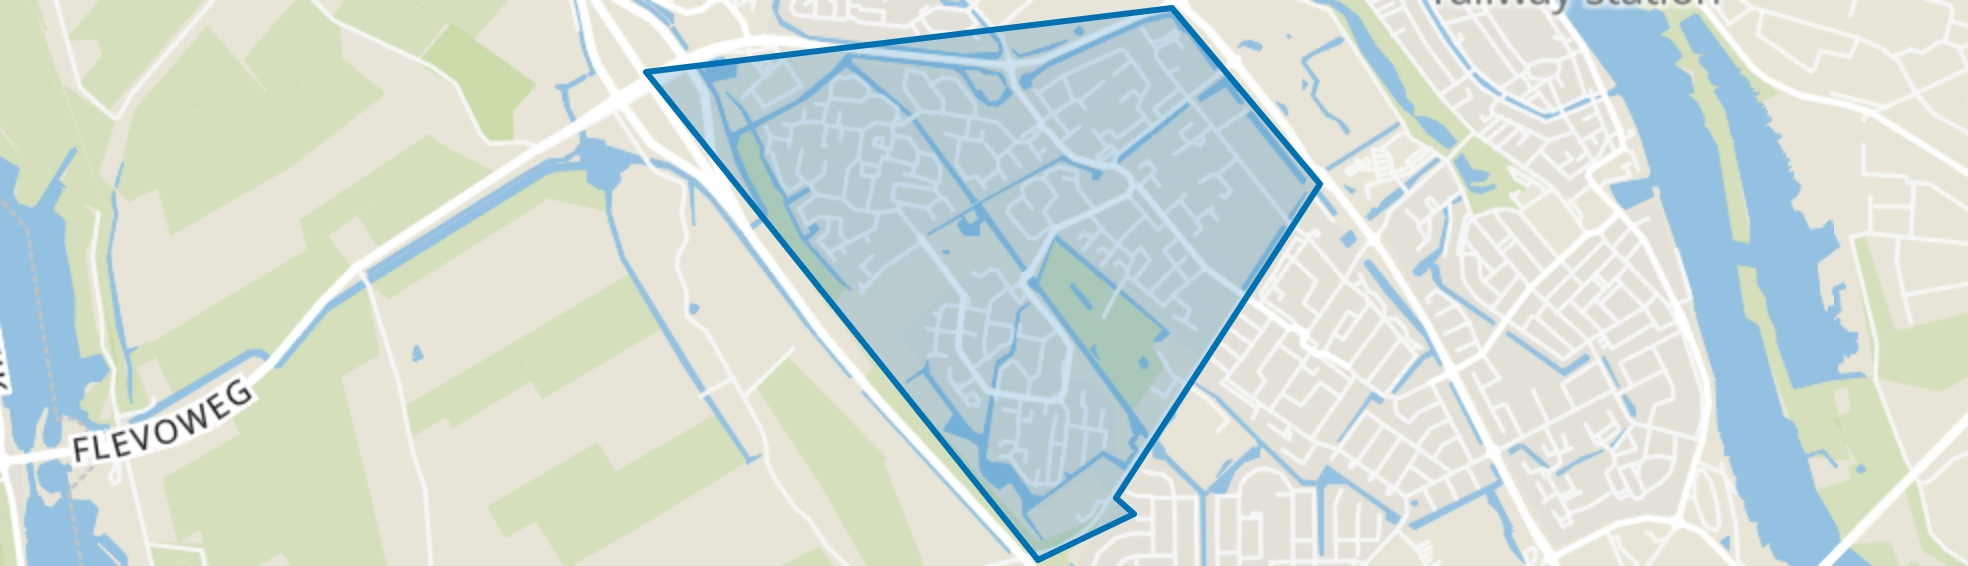 Cellesbroek, Kampen map